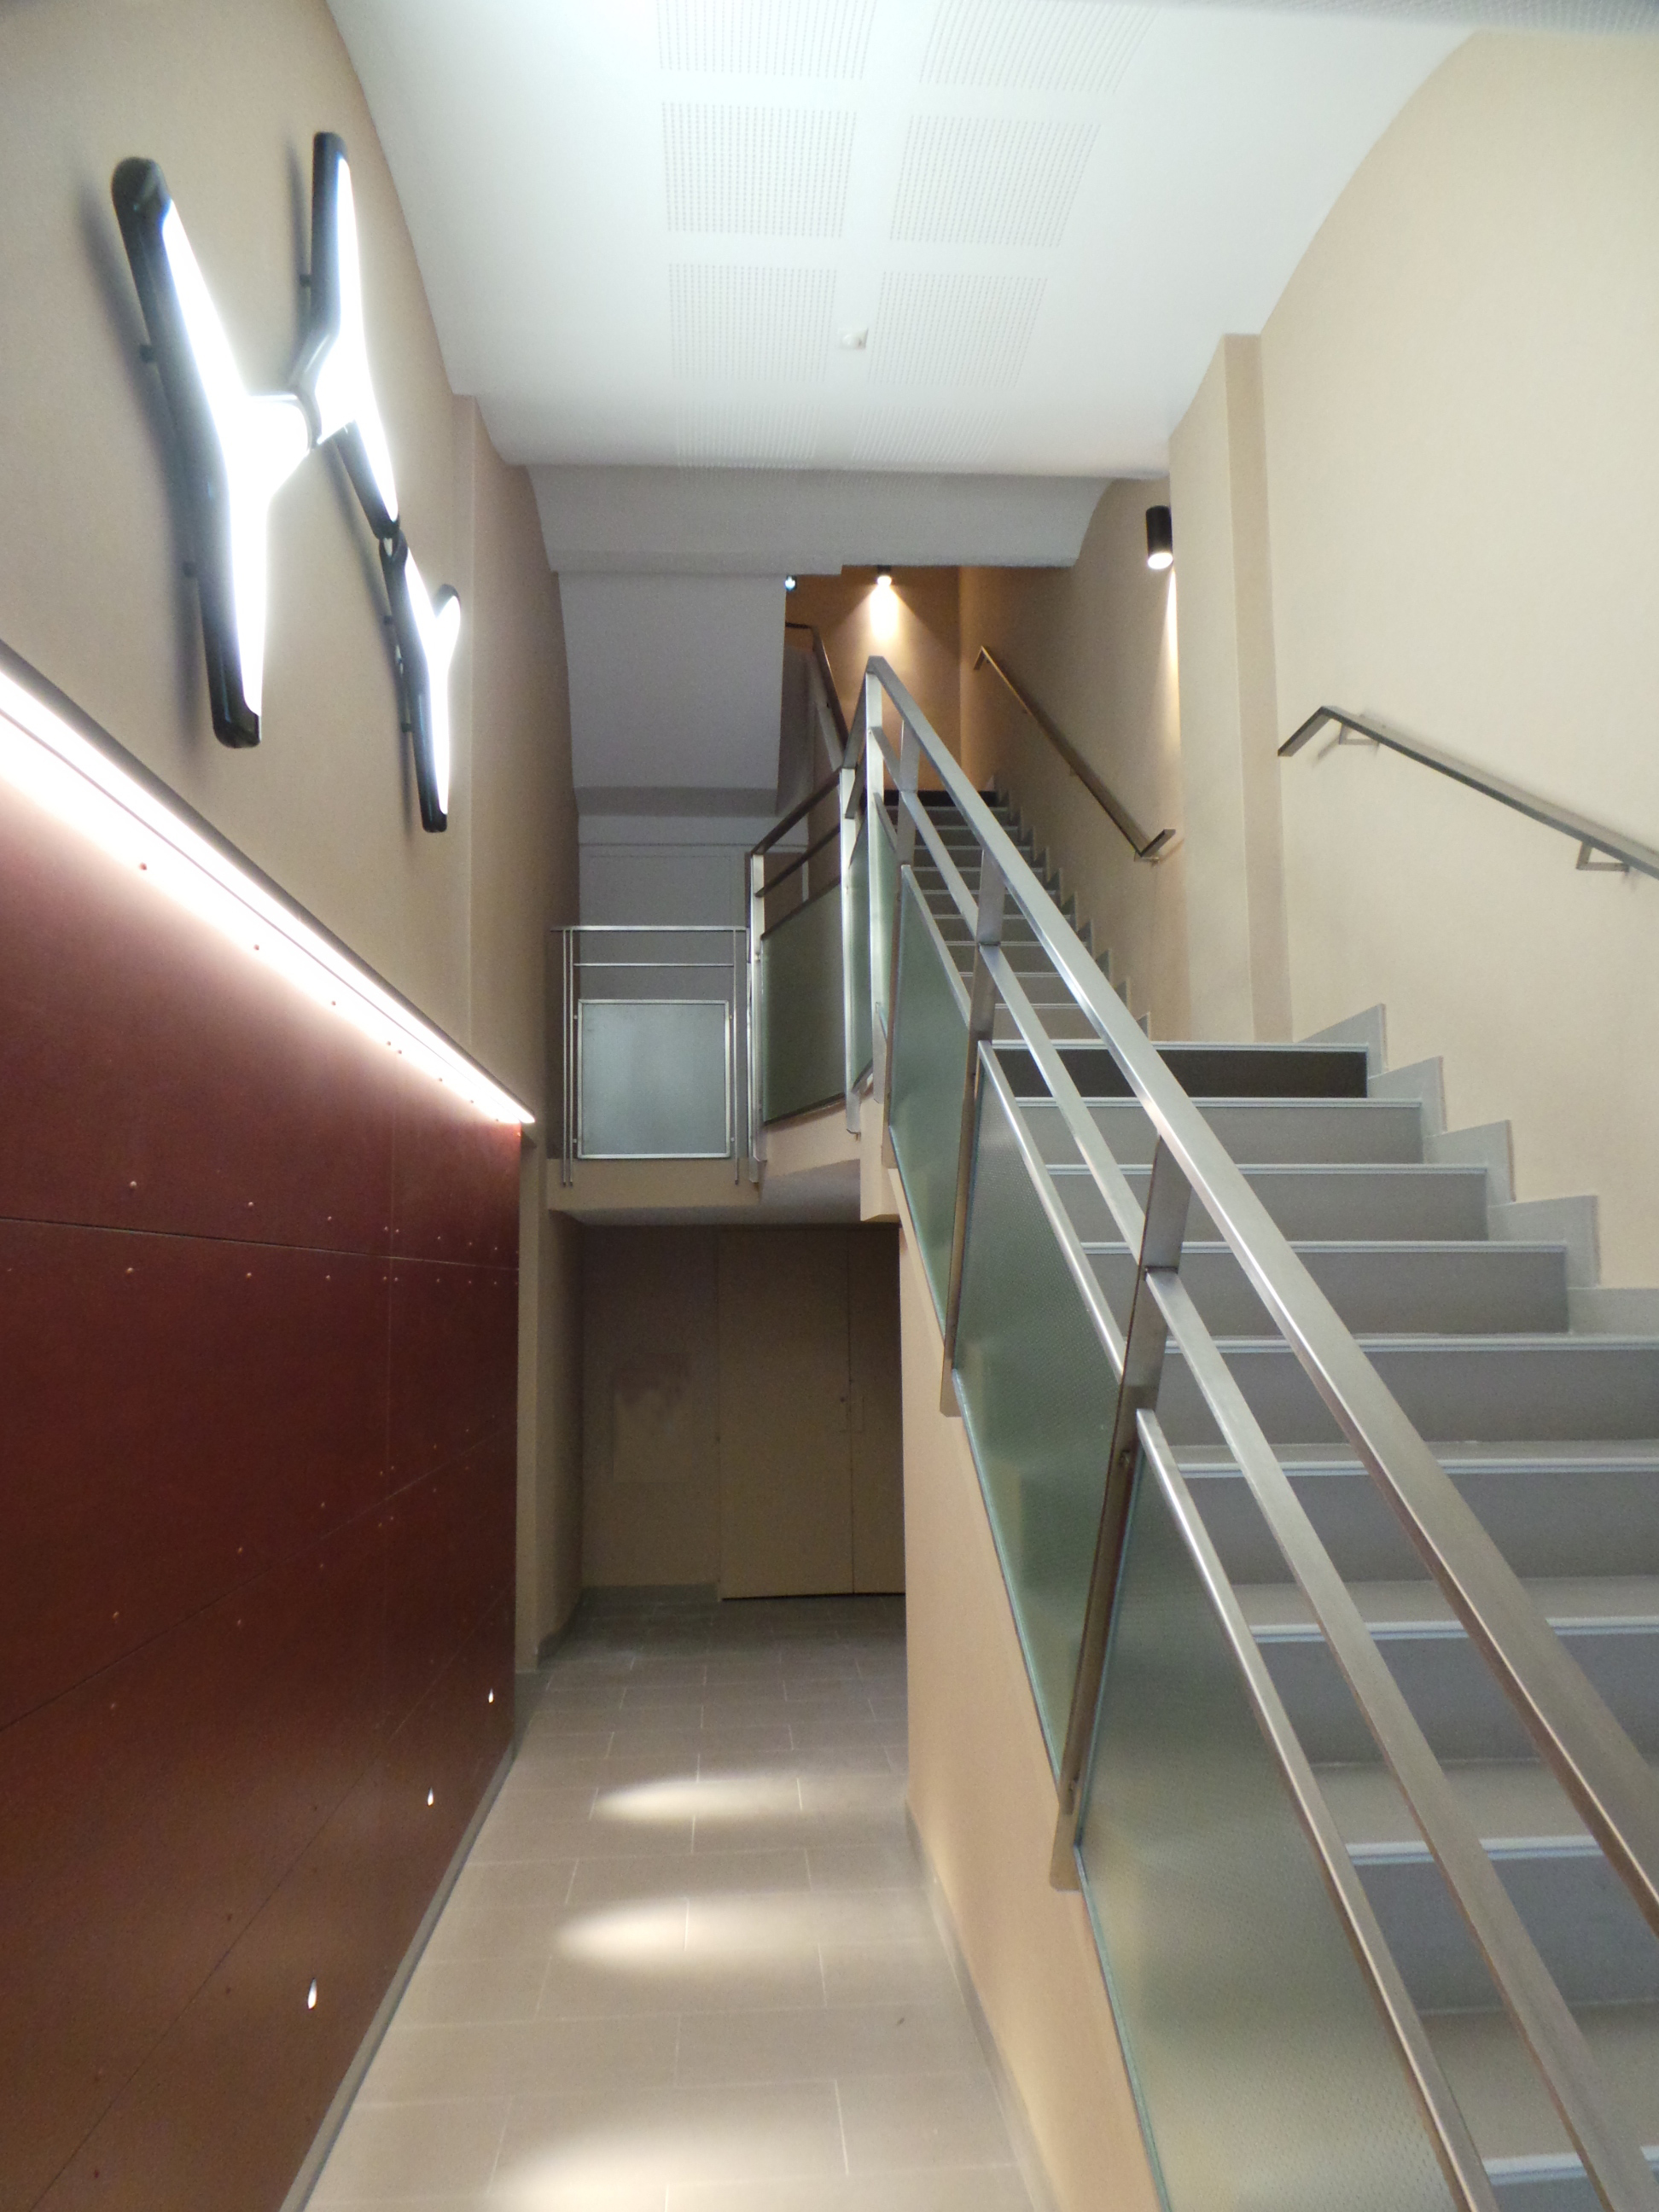 11-METZ- Bureaux - Aménagement intérieur.JPG